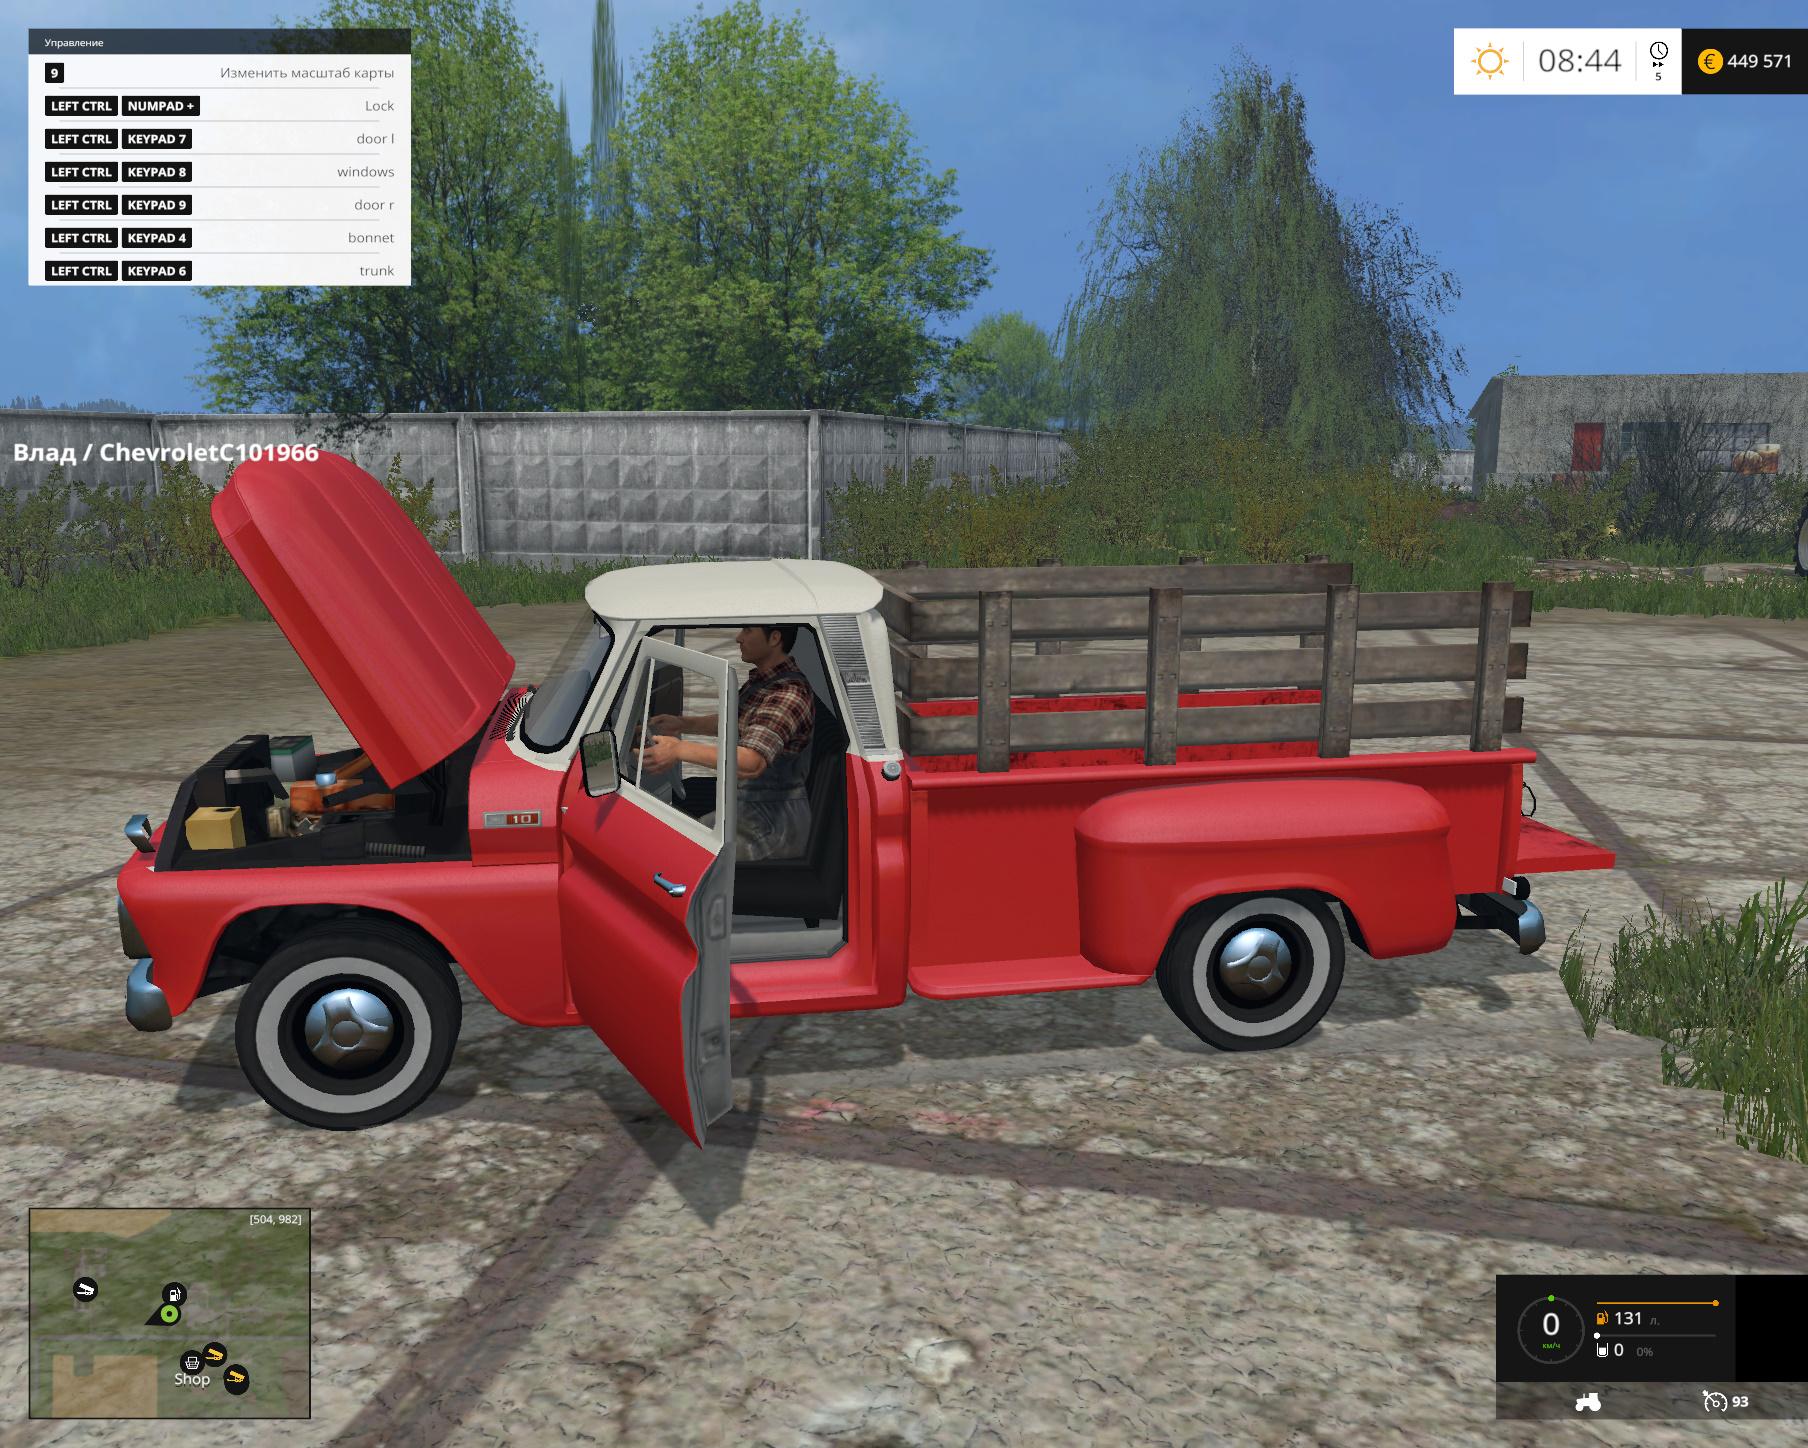 Chevrolet C10 v1 3 - Farming simulator modification